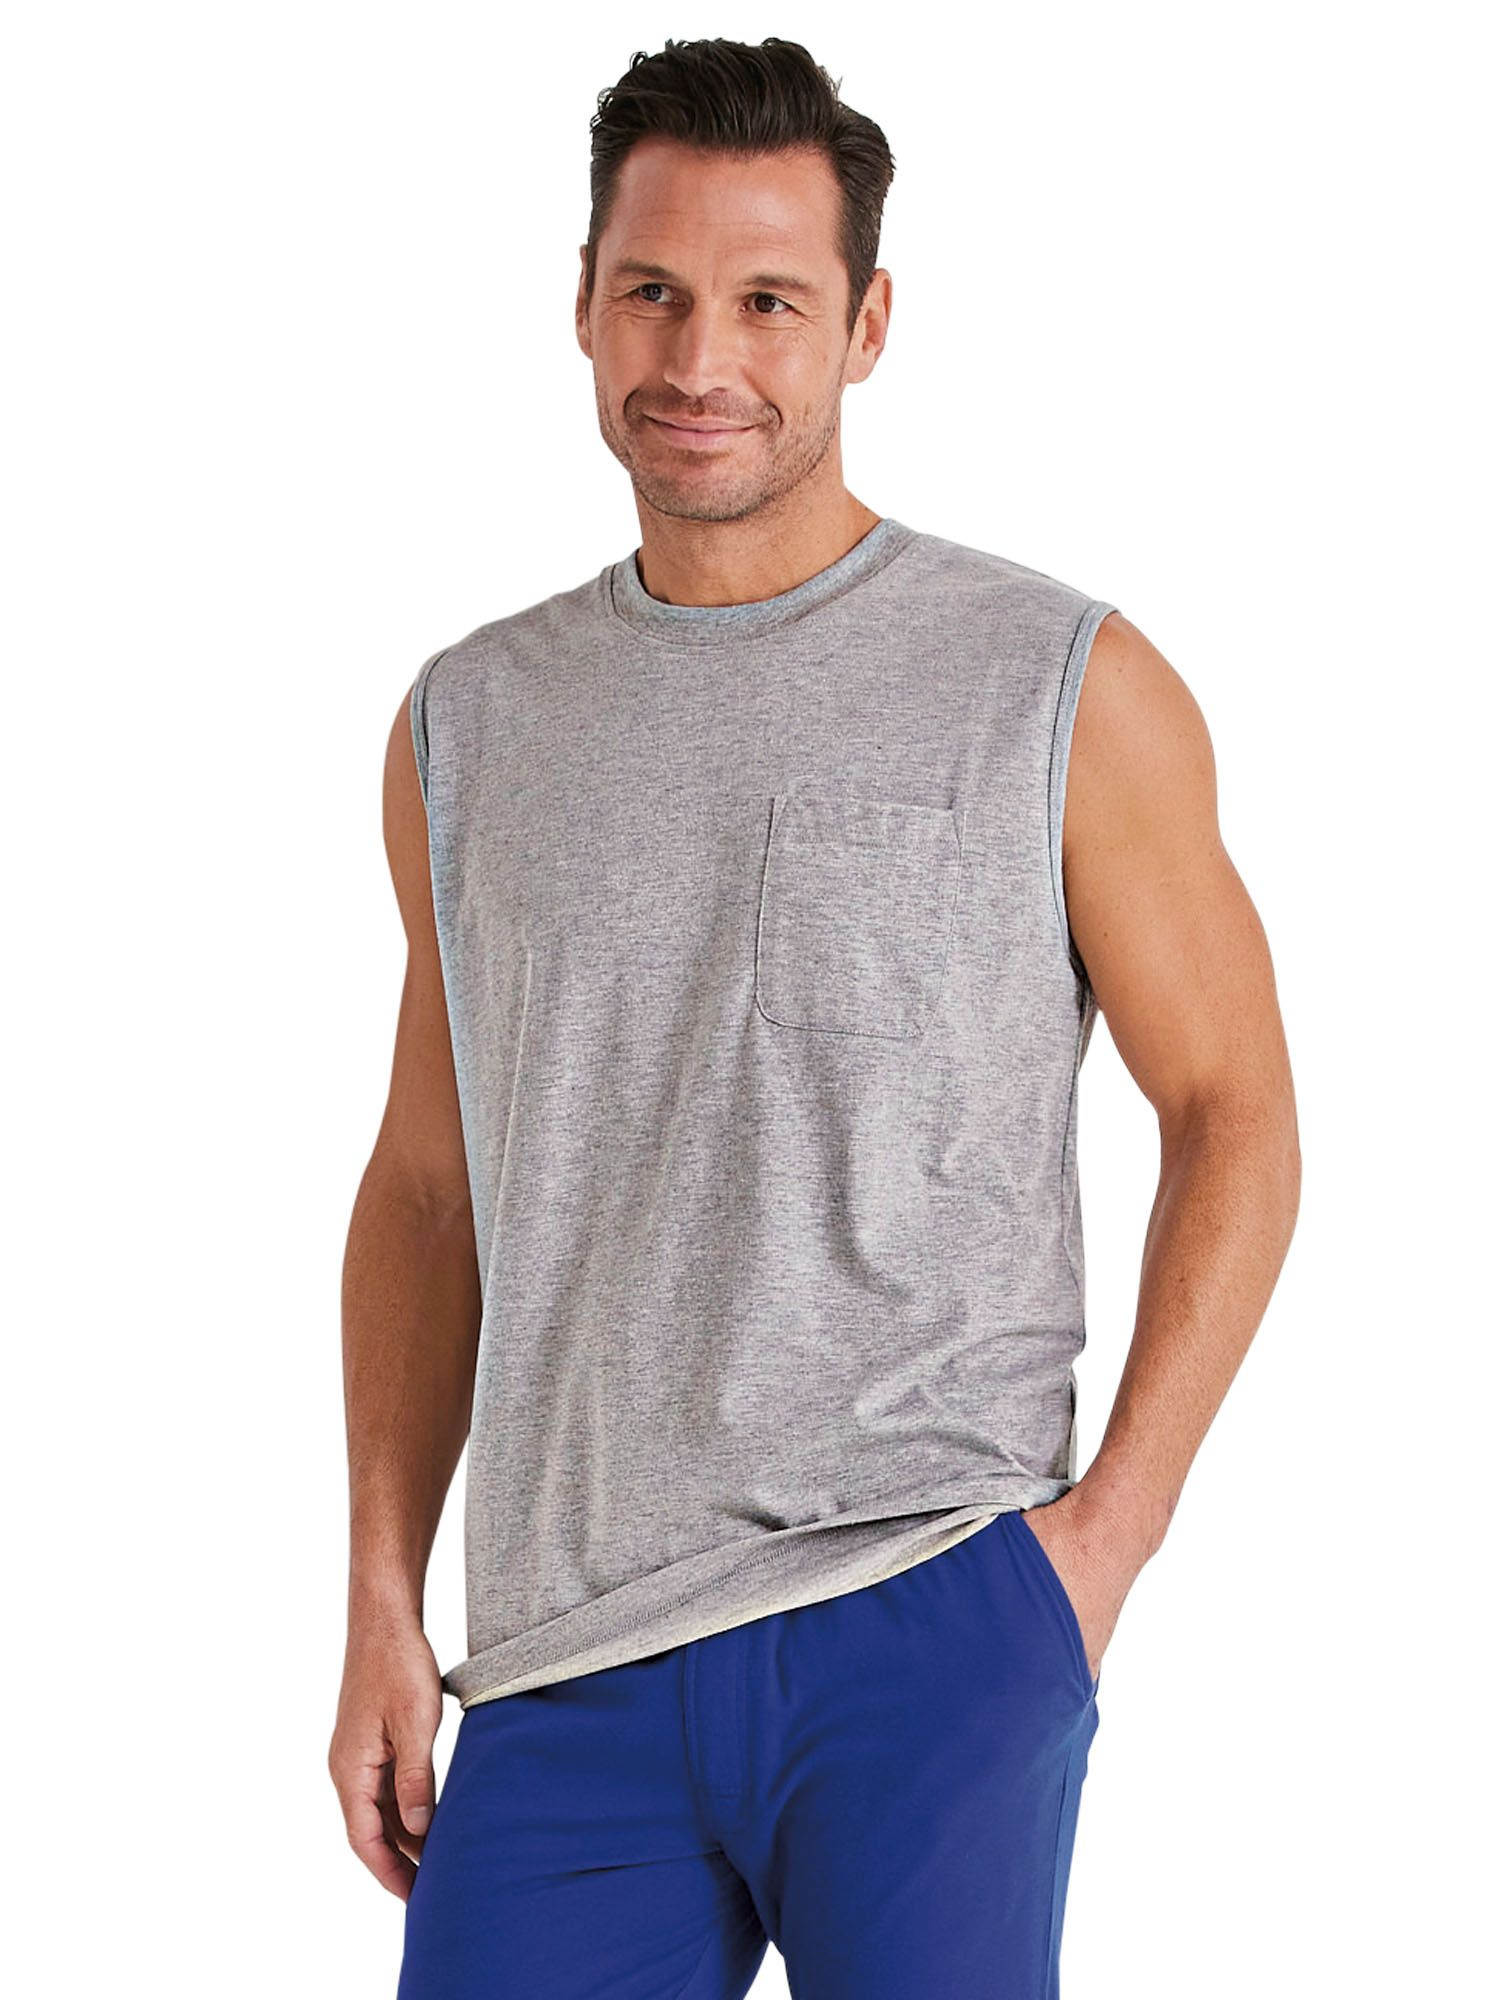 Shorts and Shirt with Pocket